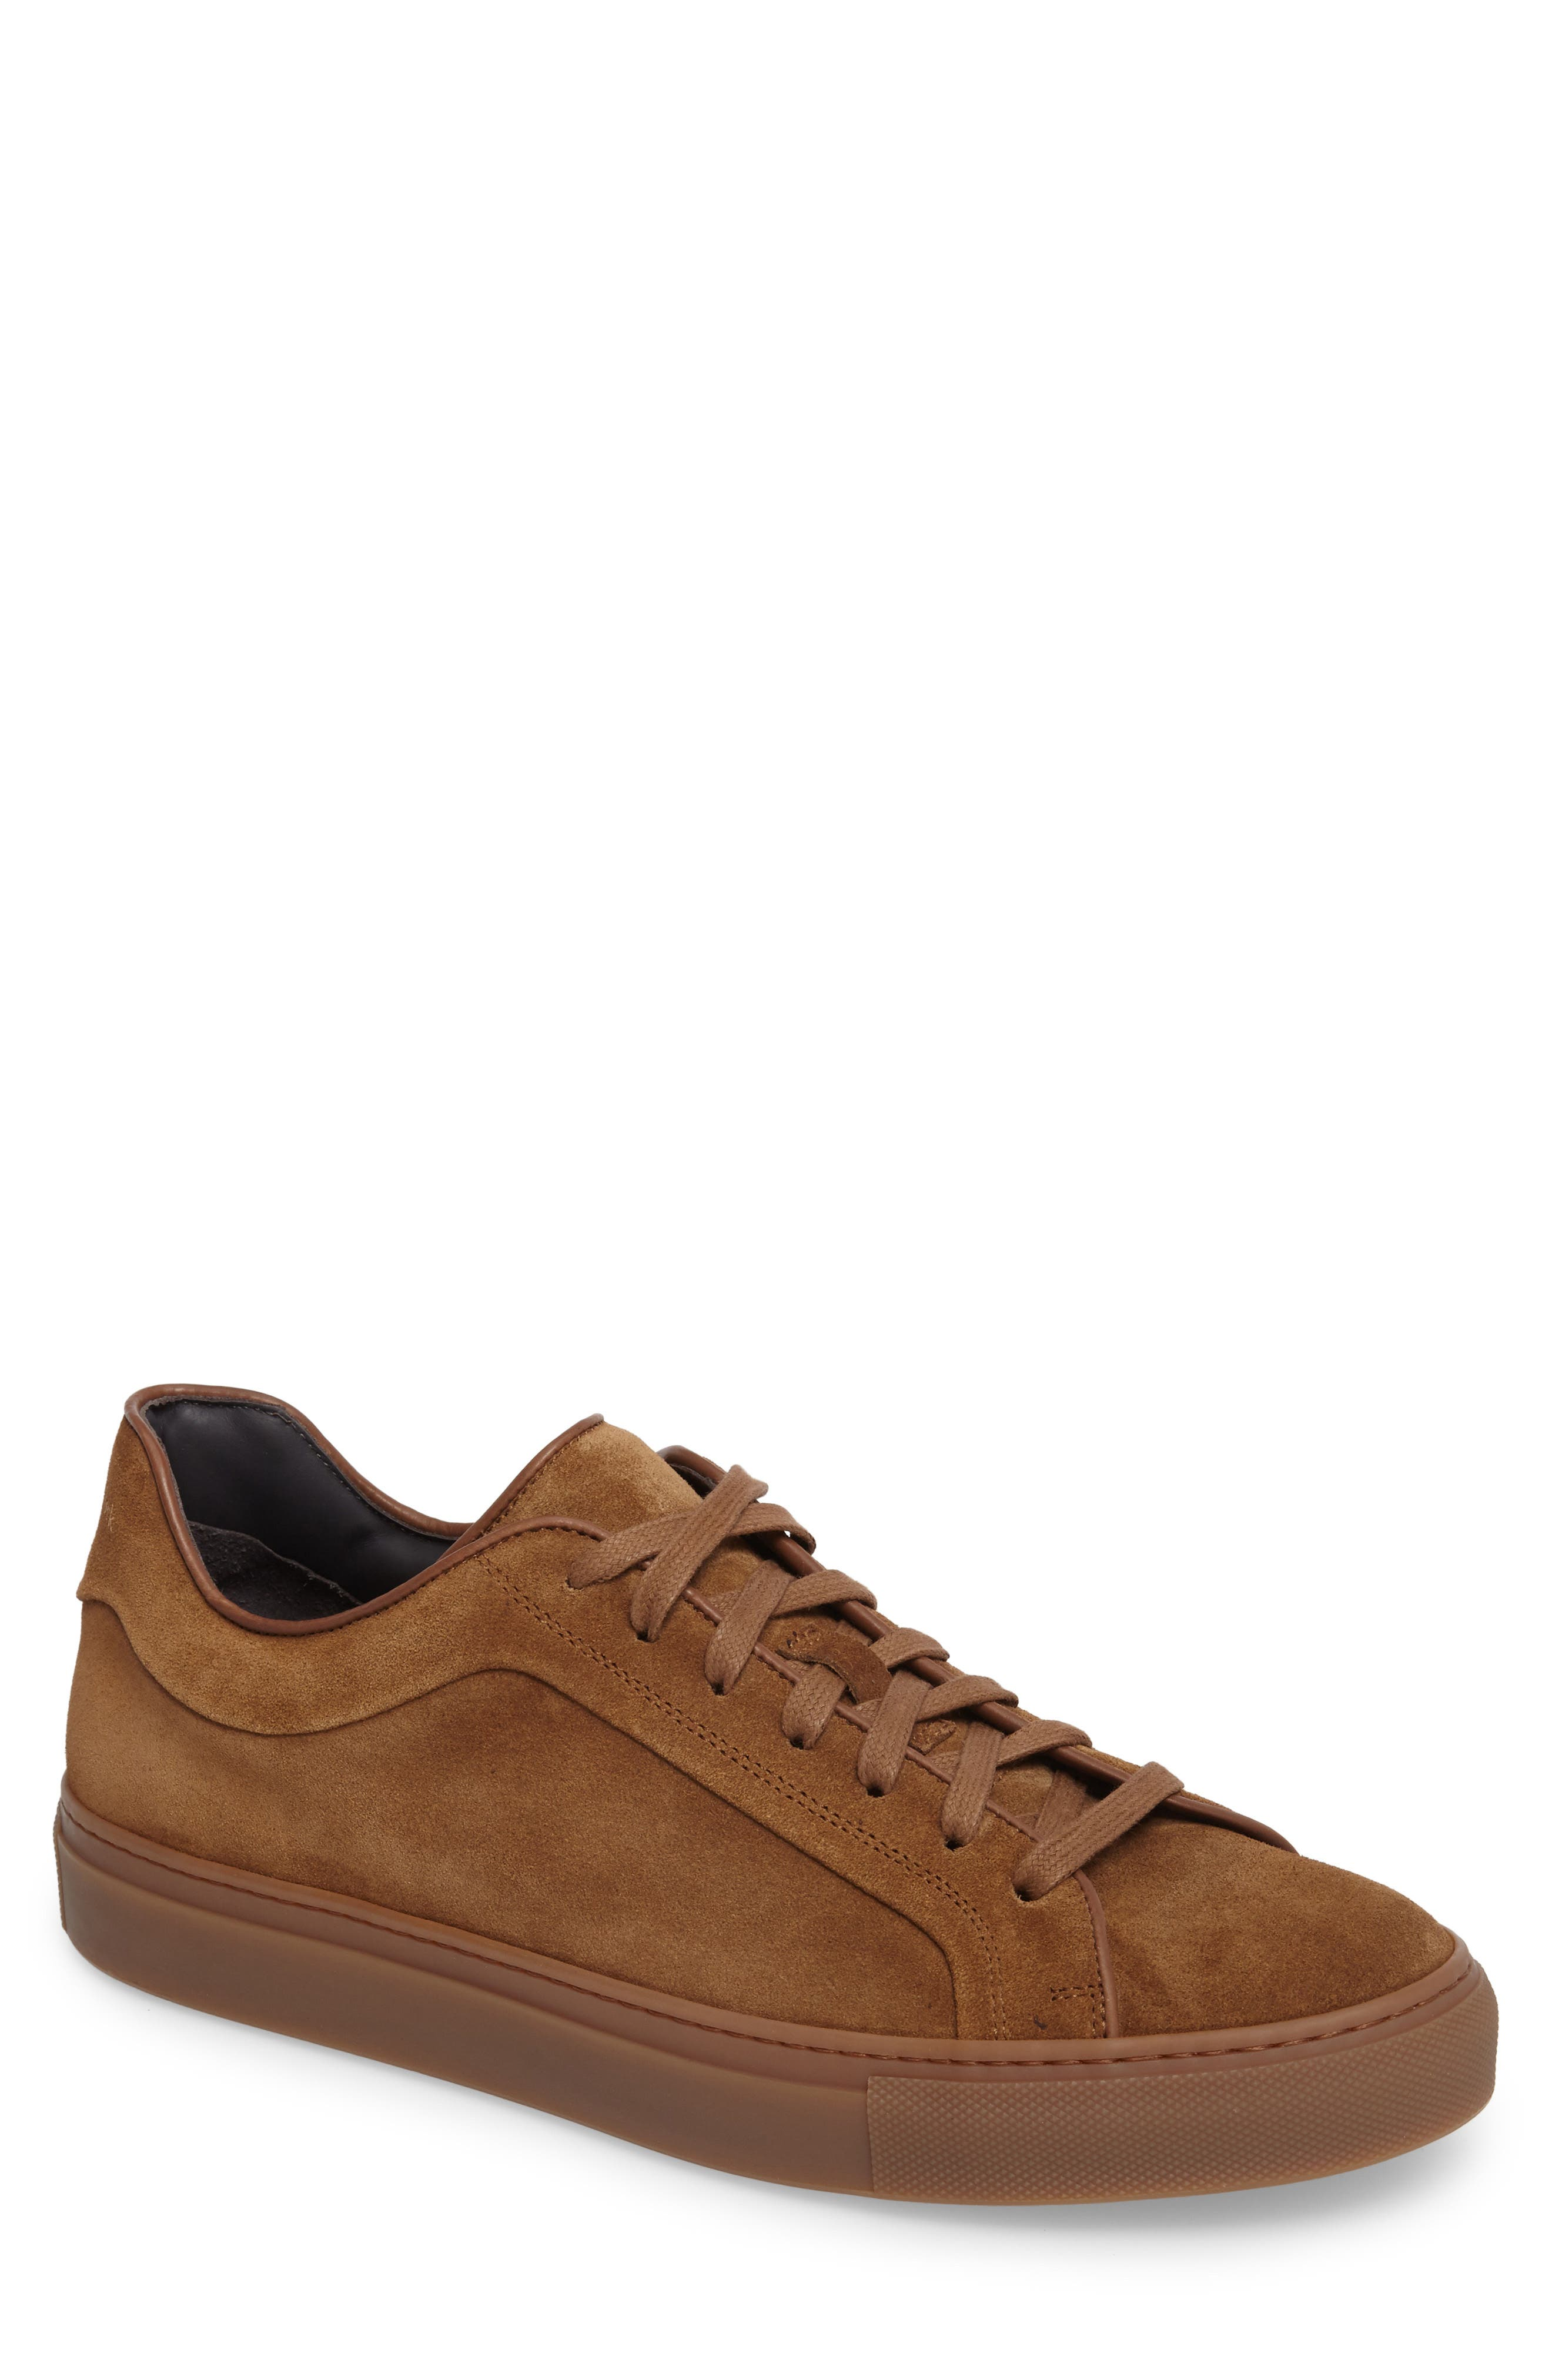 Marshall Sneaker,                             Main thumbnail 5, color,